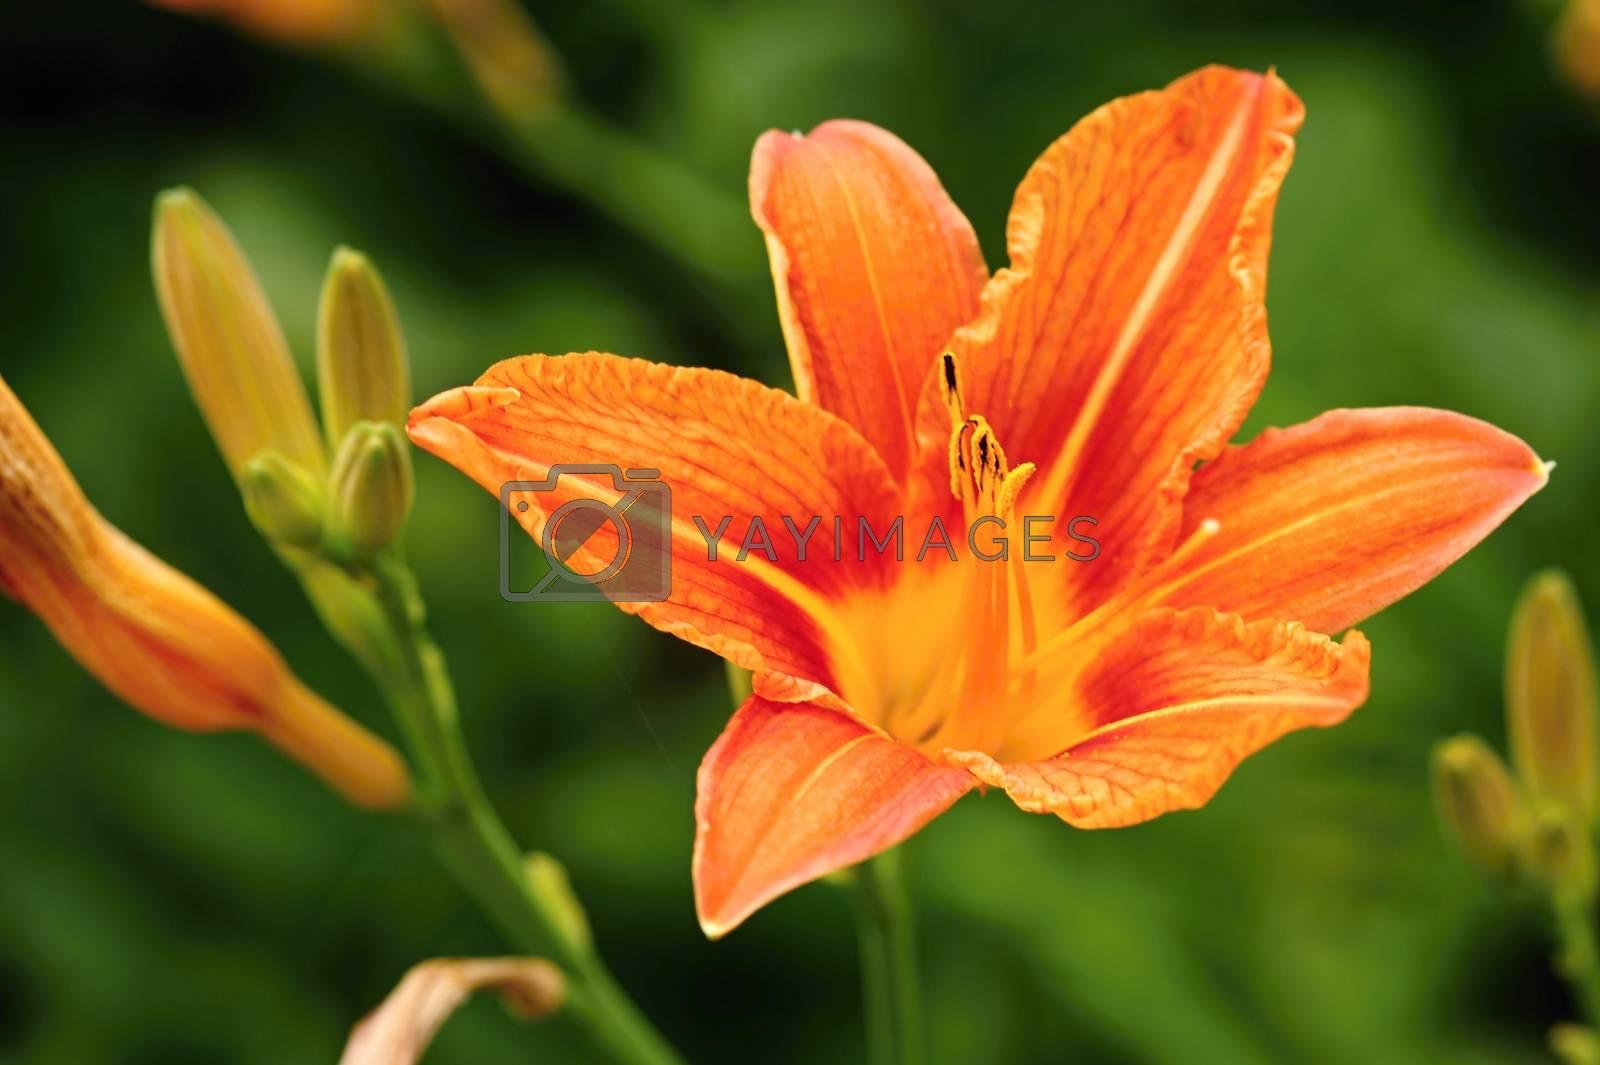 Royalty free image of Orange lily by ondrej83